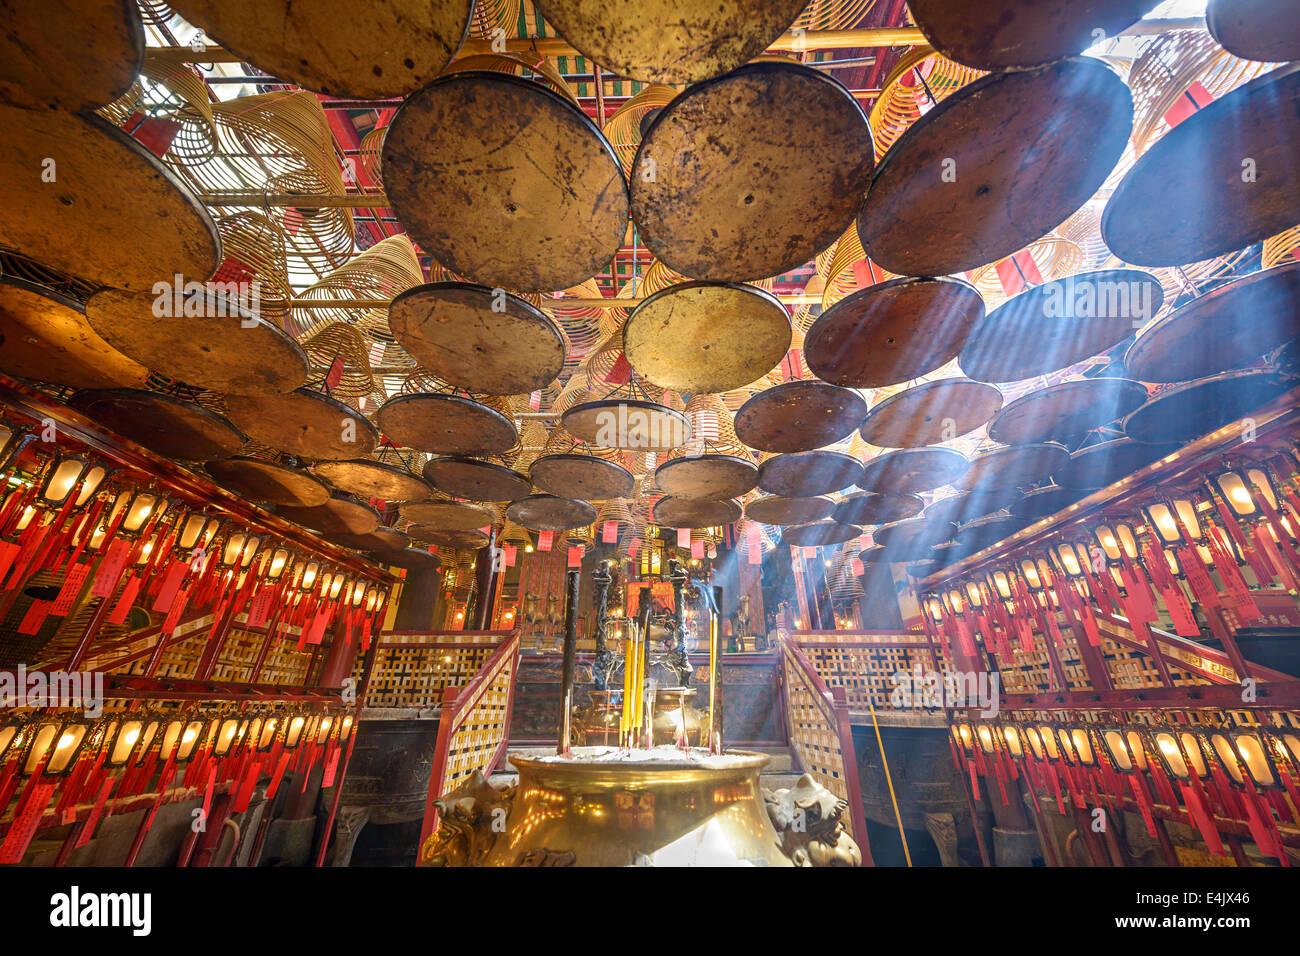 Temple Man Mo à Hong Kong, Chine. Photo Stock